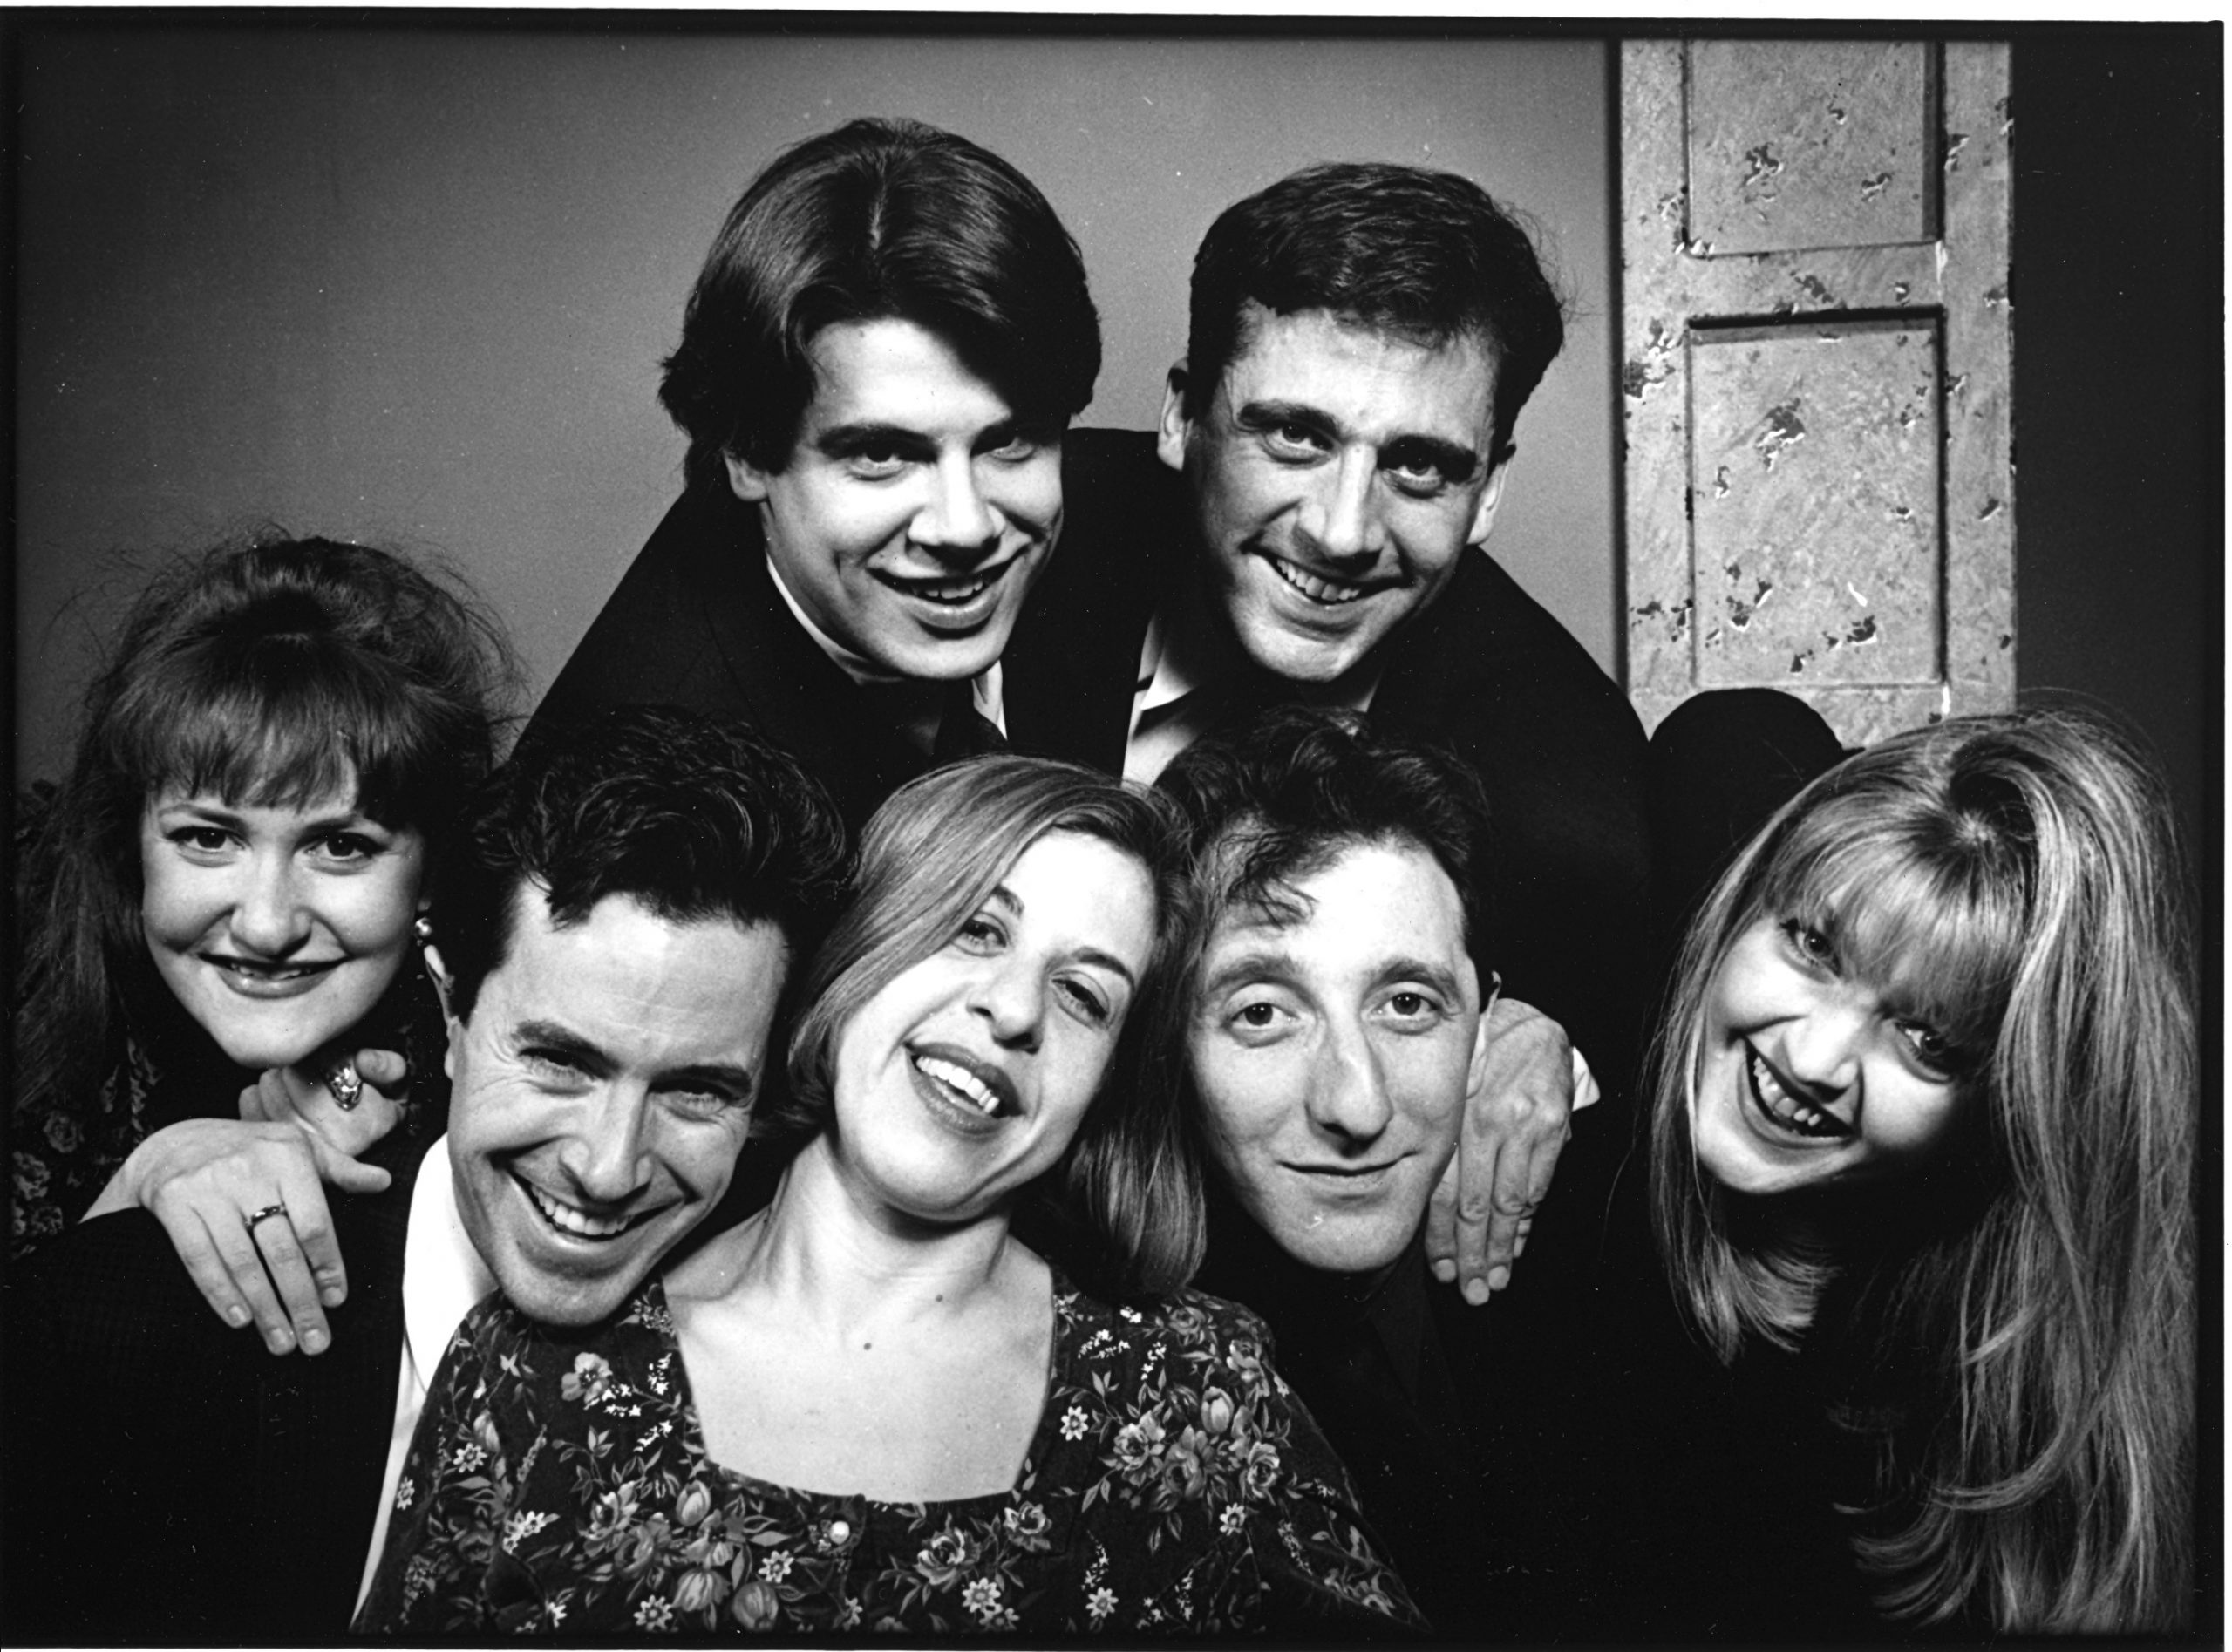 Ruth Rudnick, Colbert, Scott Allman, Jackie Hoffman, Steve Carell, David Razowsky, Fran Adams